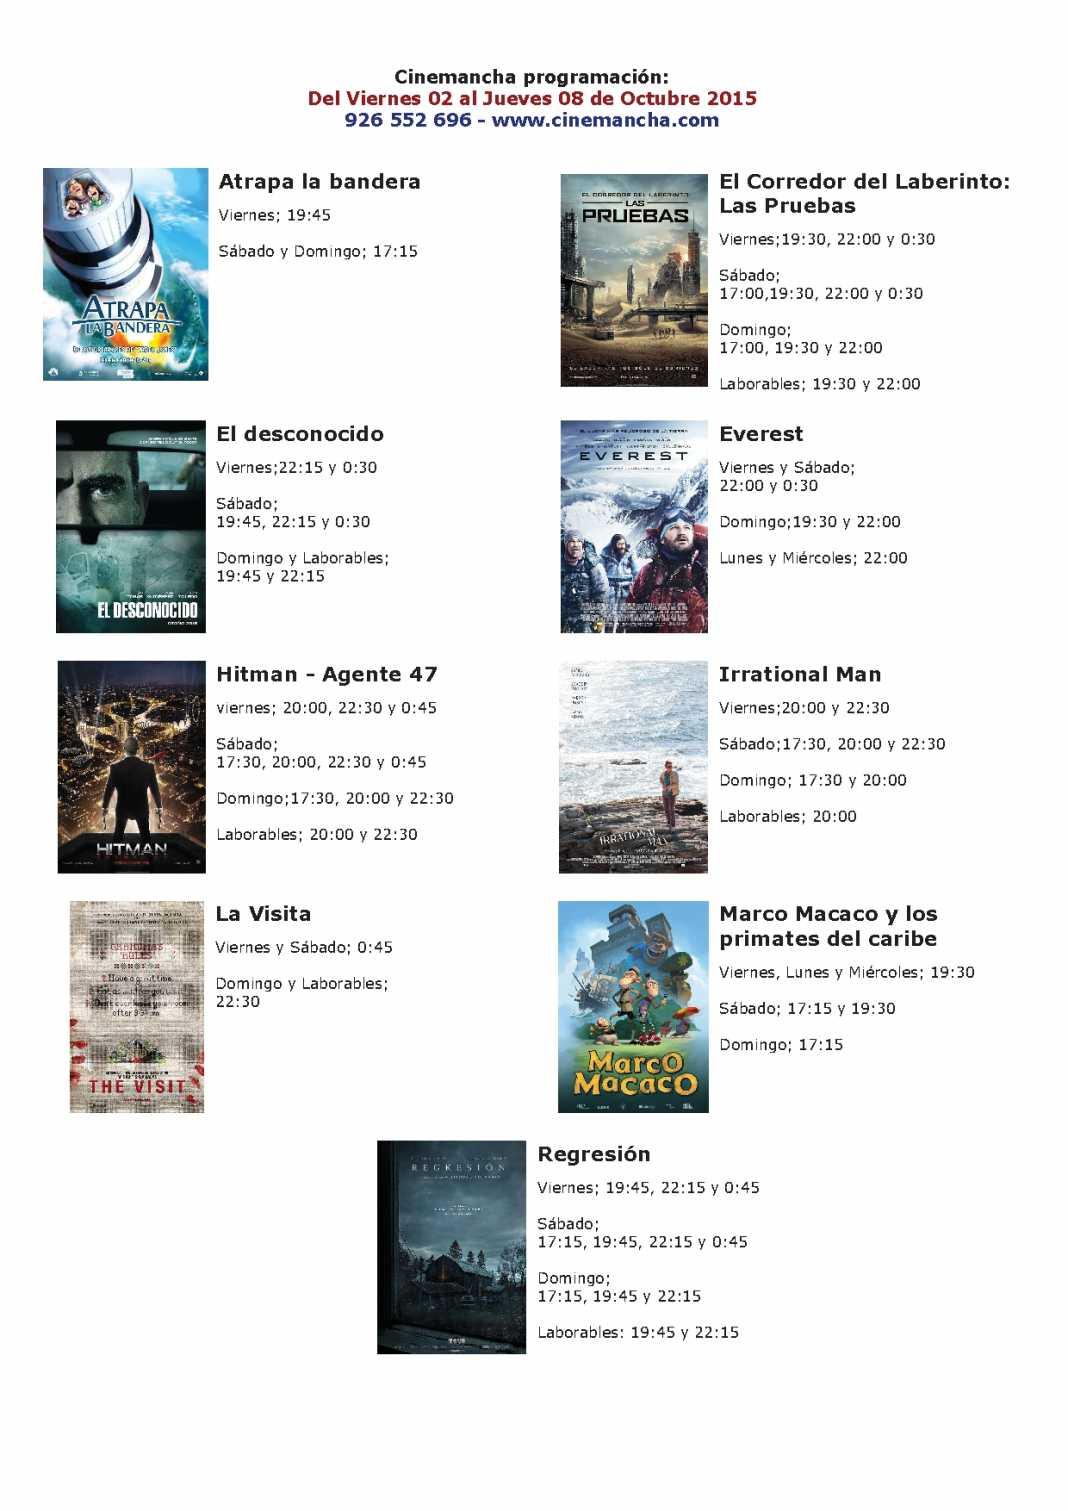 Cartelera Cinemancha del 2 al 8 de octubre 1